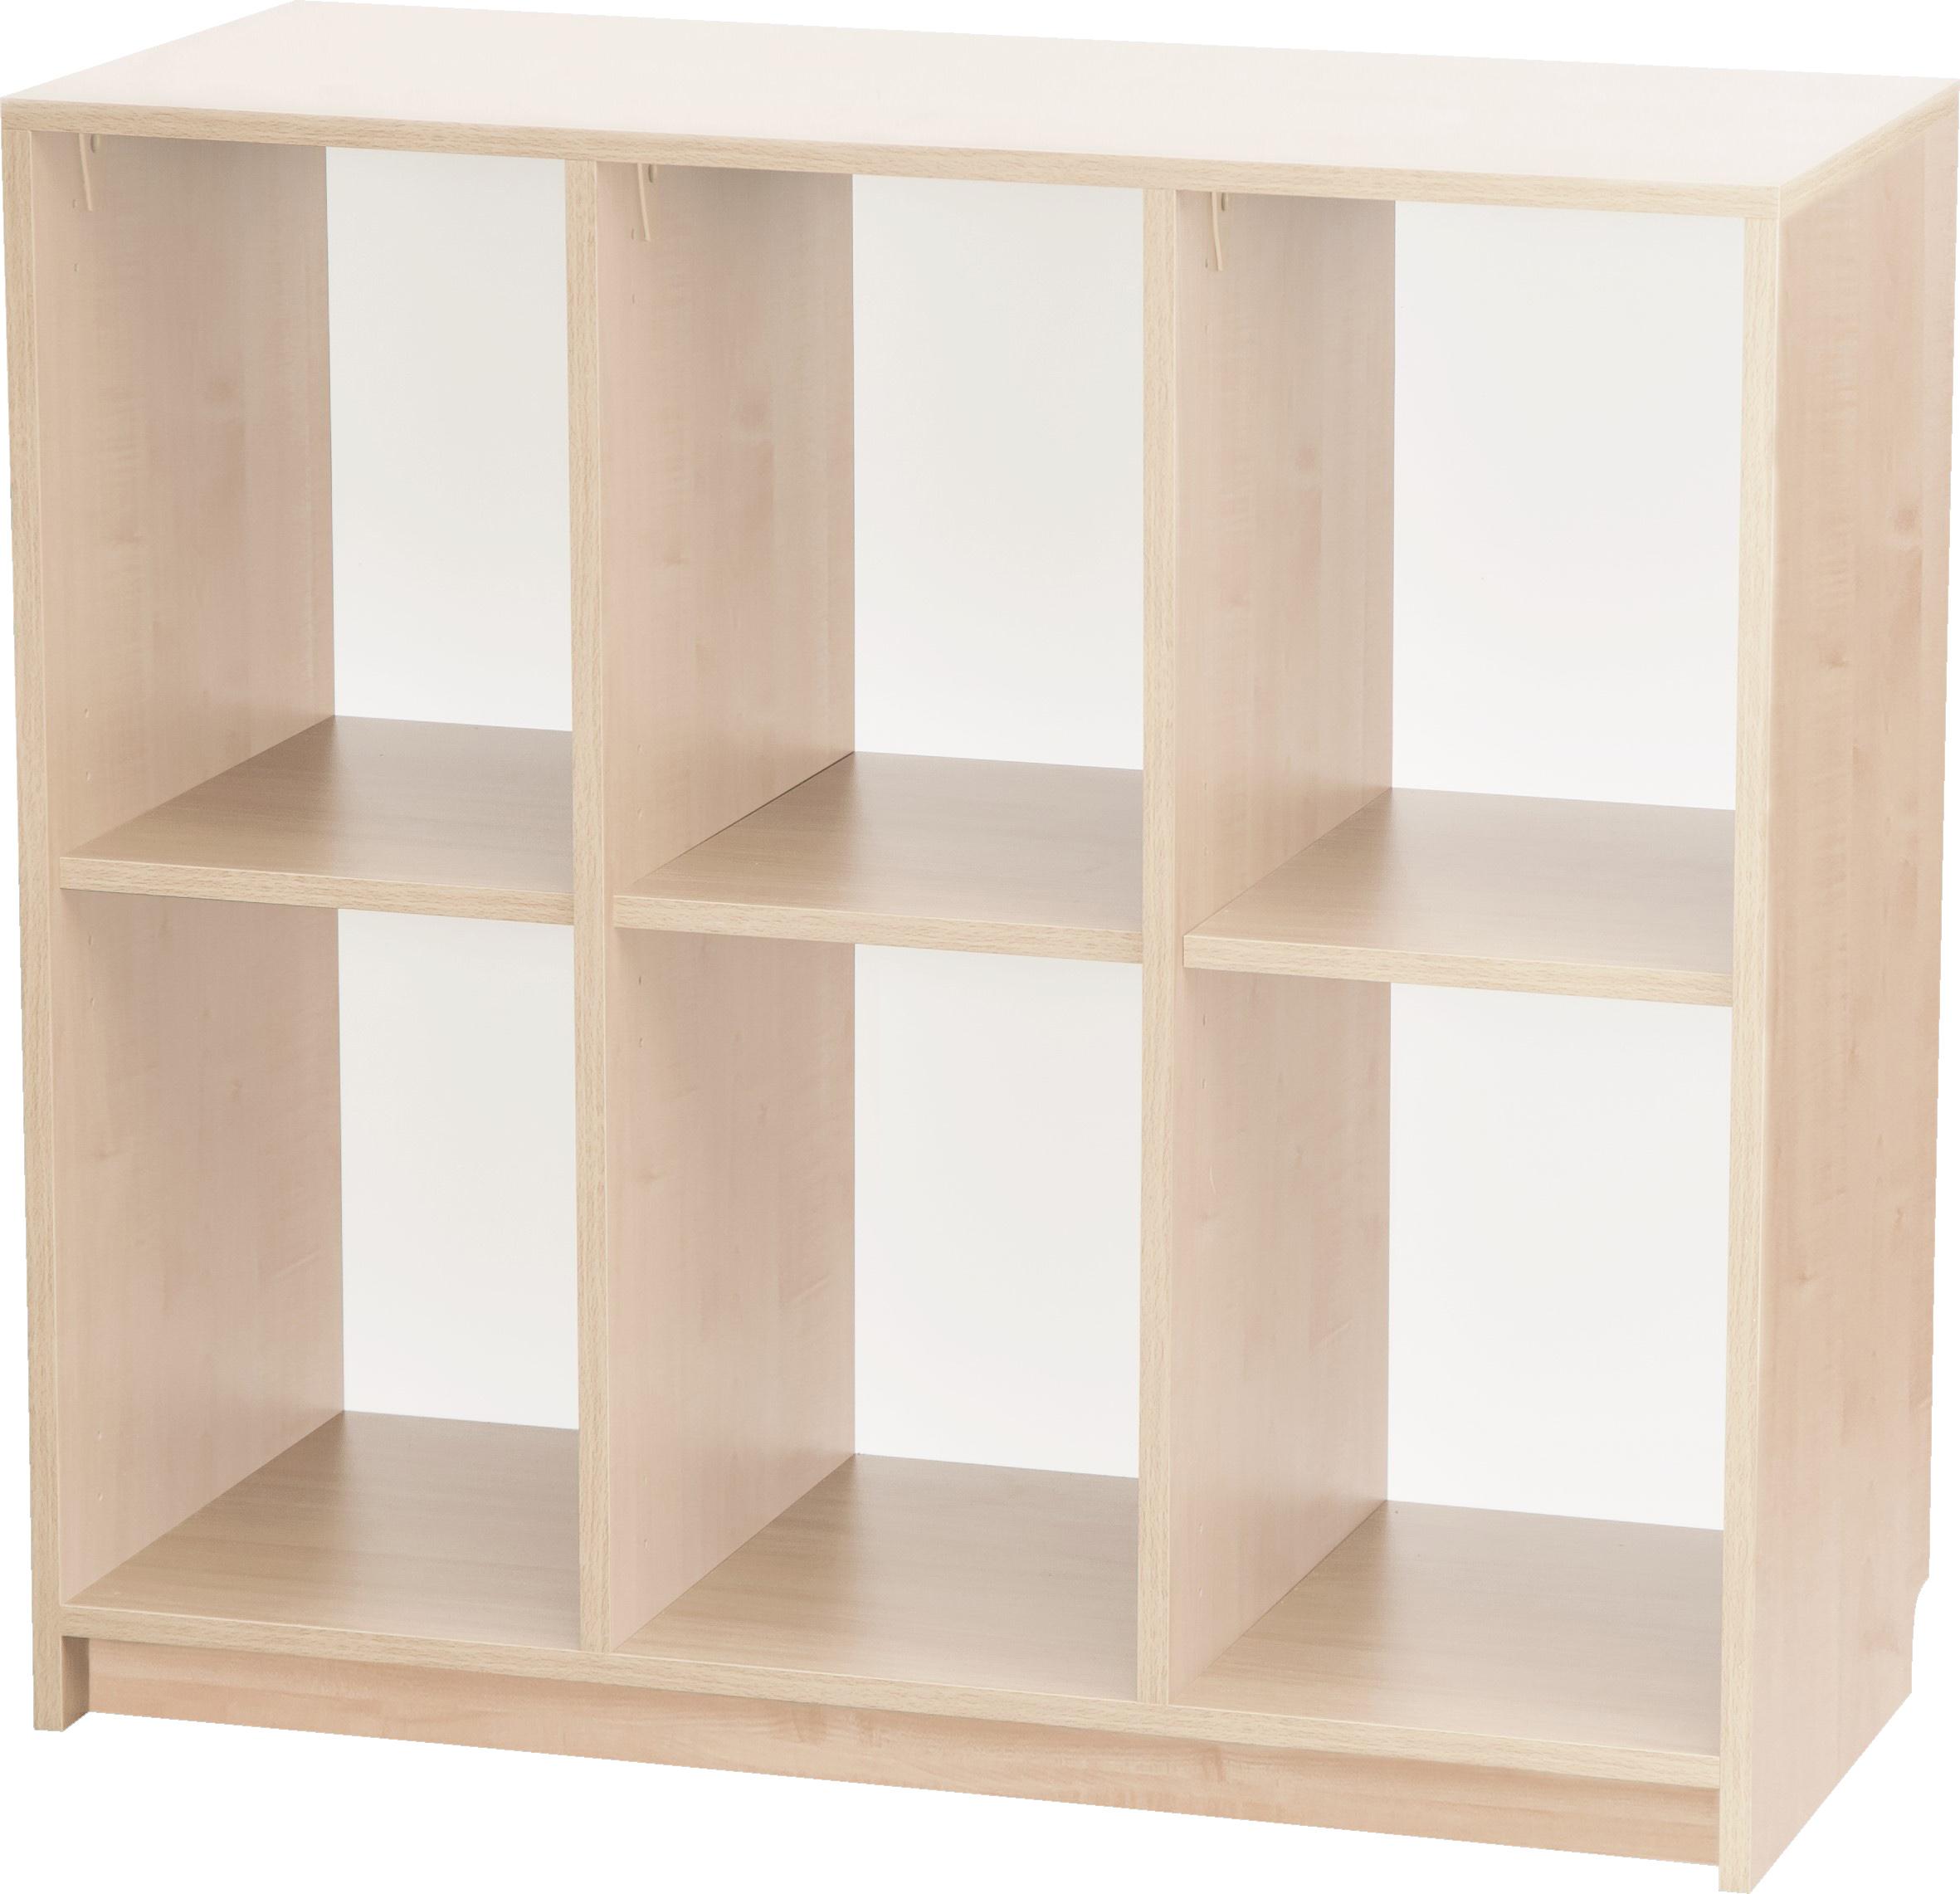 meuble de rangement de novum par ludesign - Ludesign